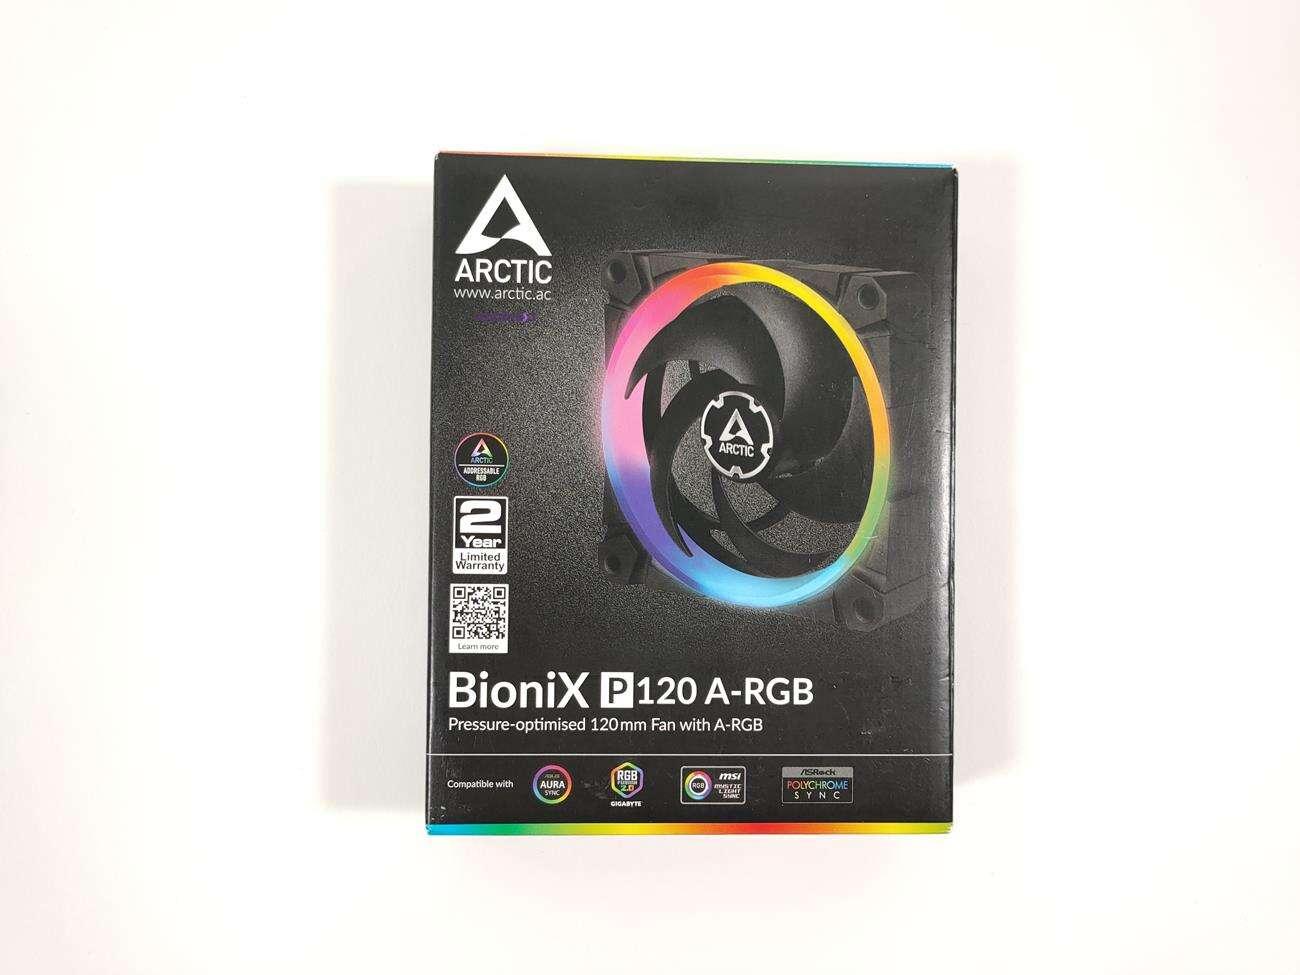 test Arctic BioniX P120 A-RGB, recenzja Arctic BioniX P120 A-RGB, opinia Arctic BioniX P120 A-RGB